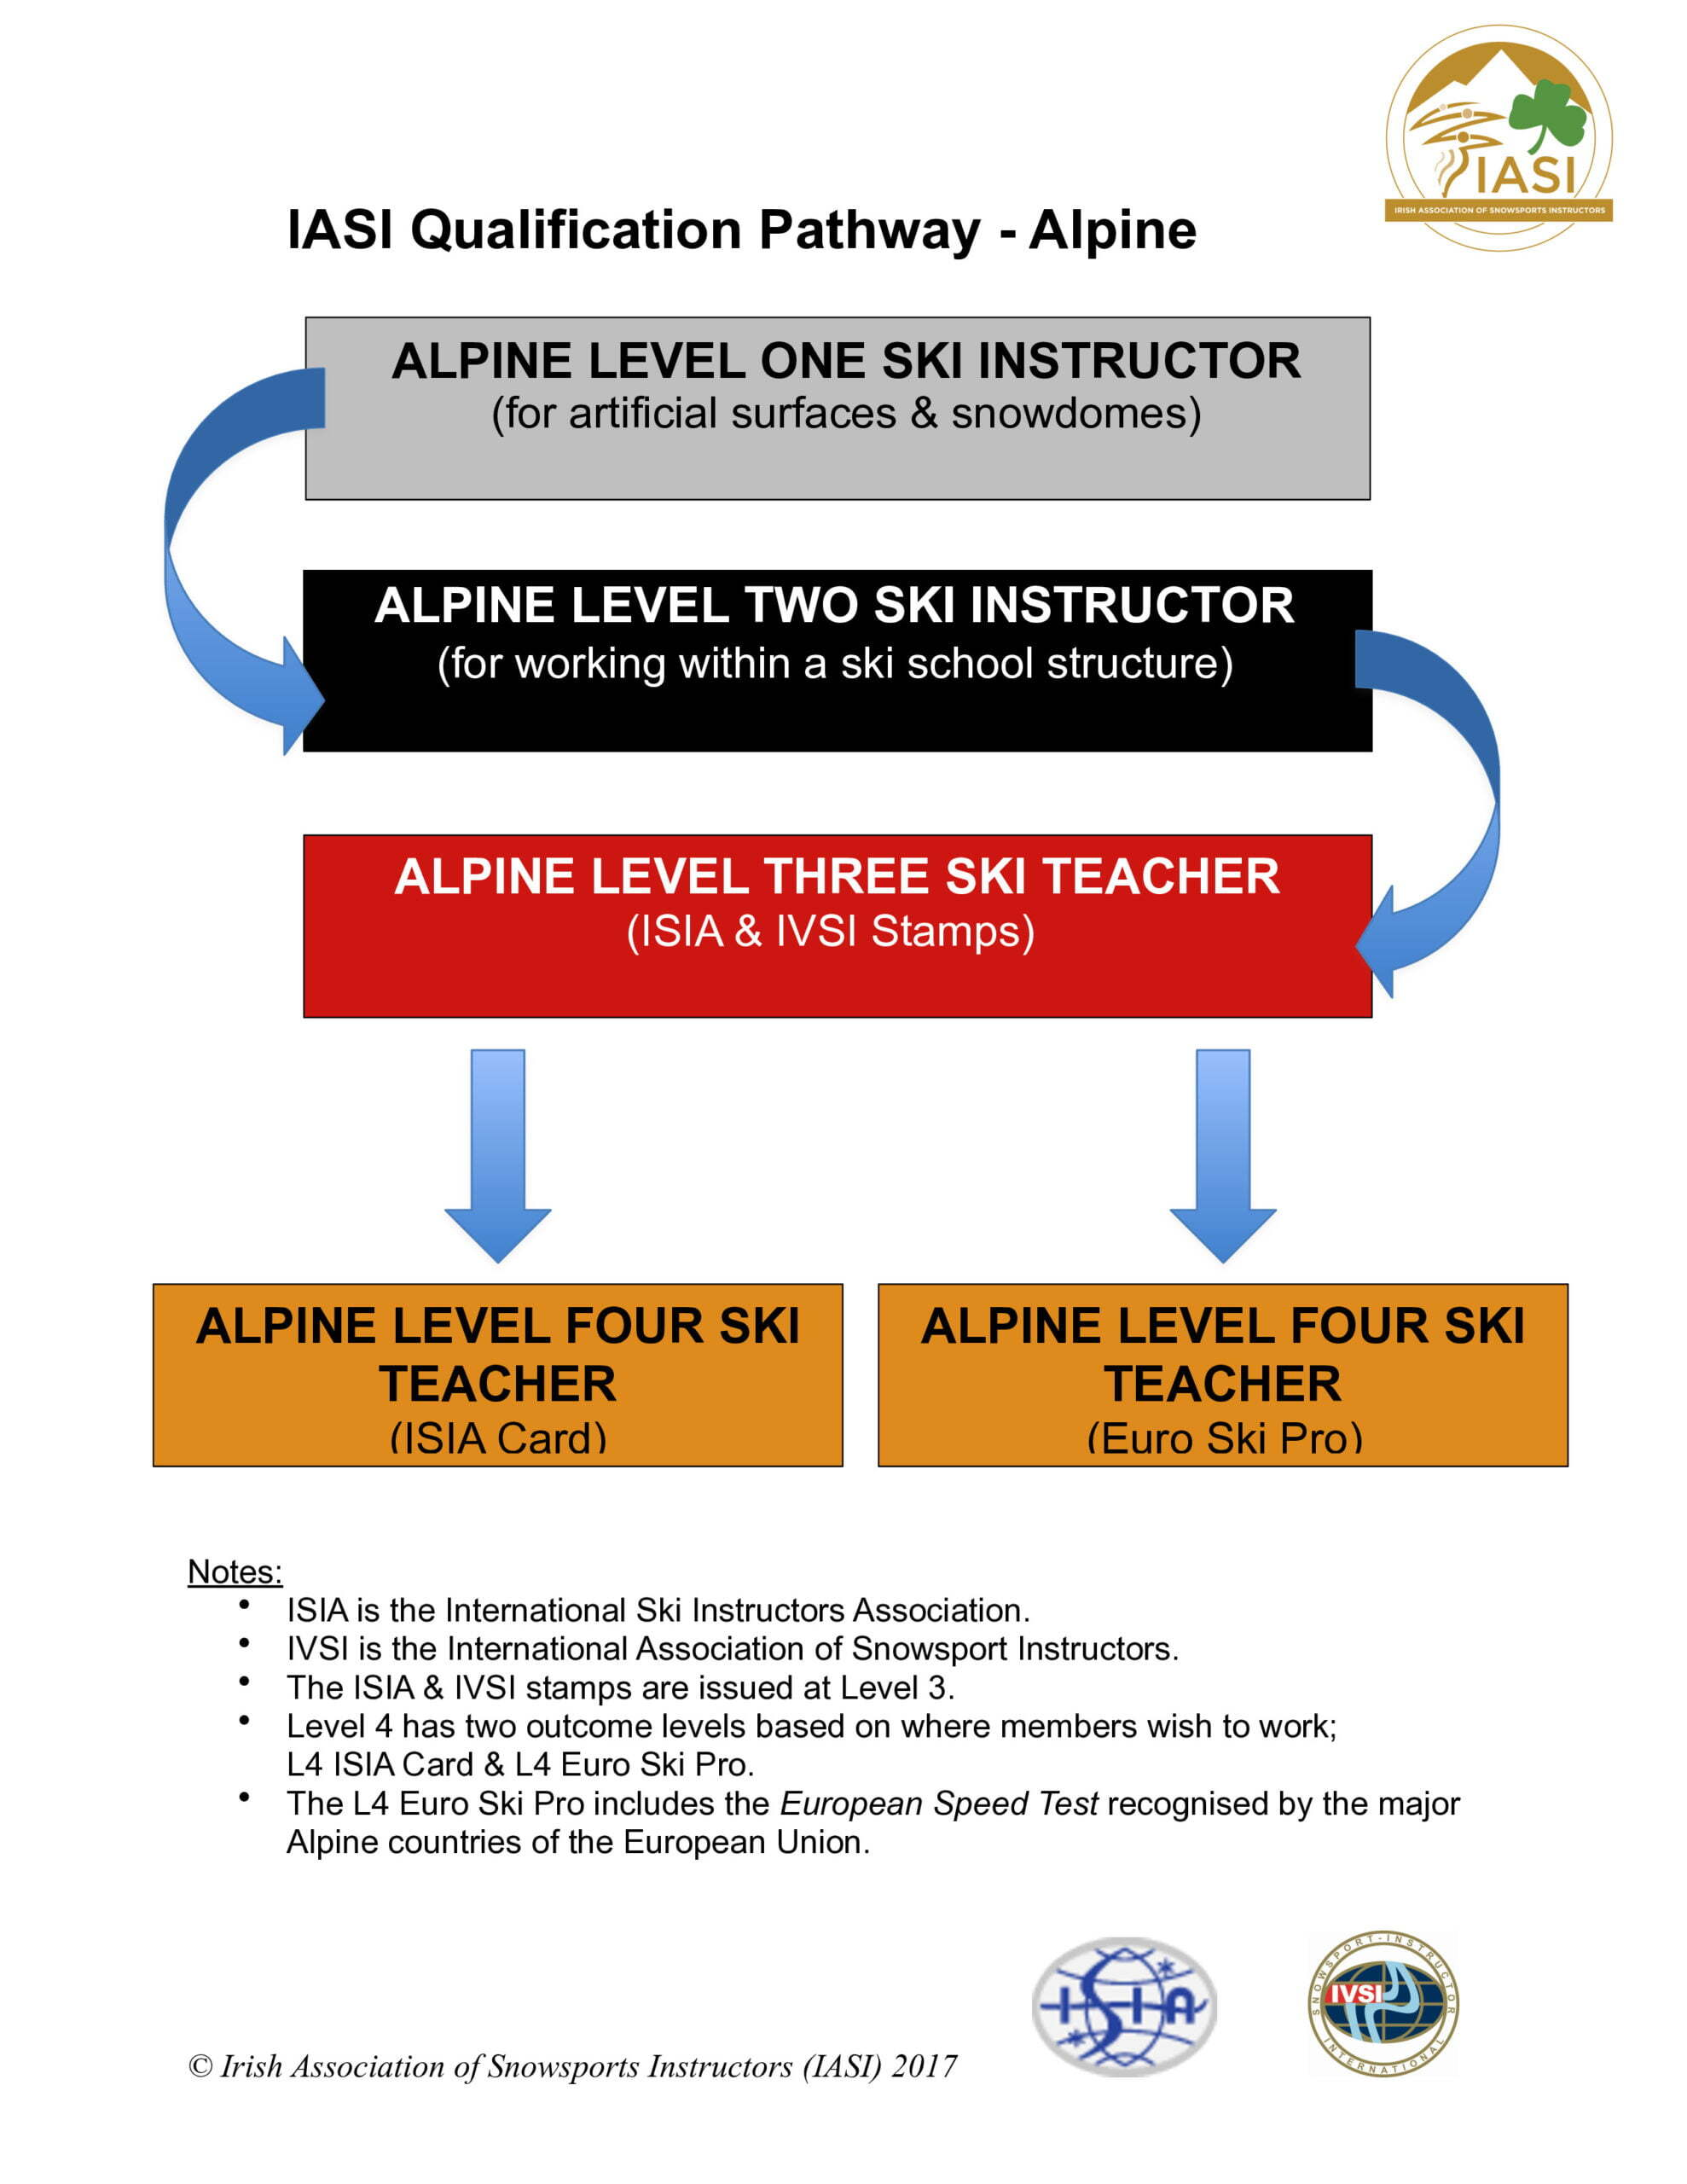 Qualifications Pathway